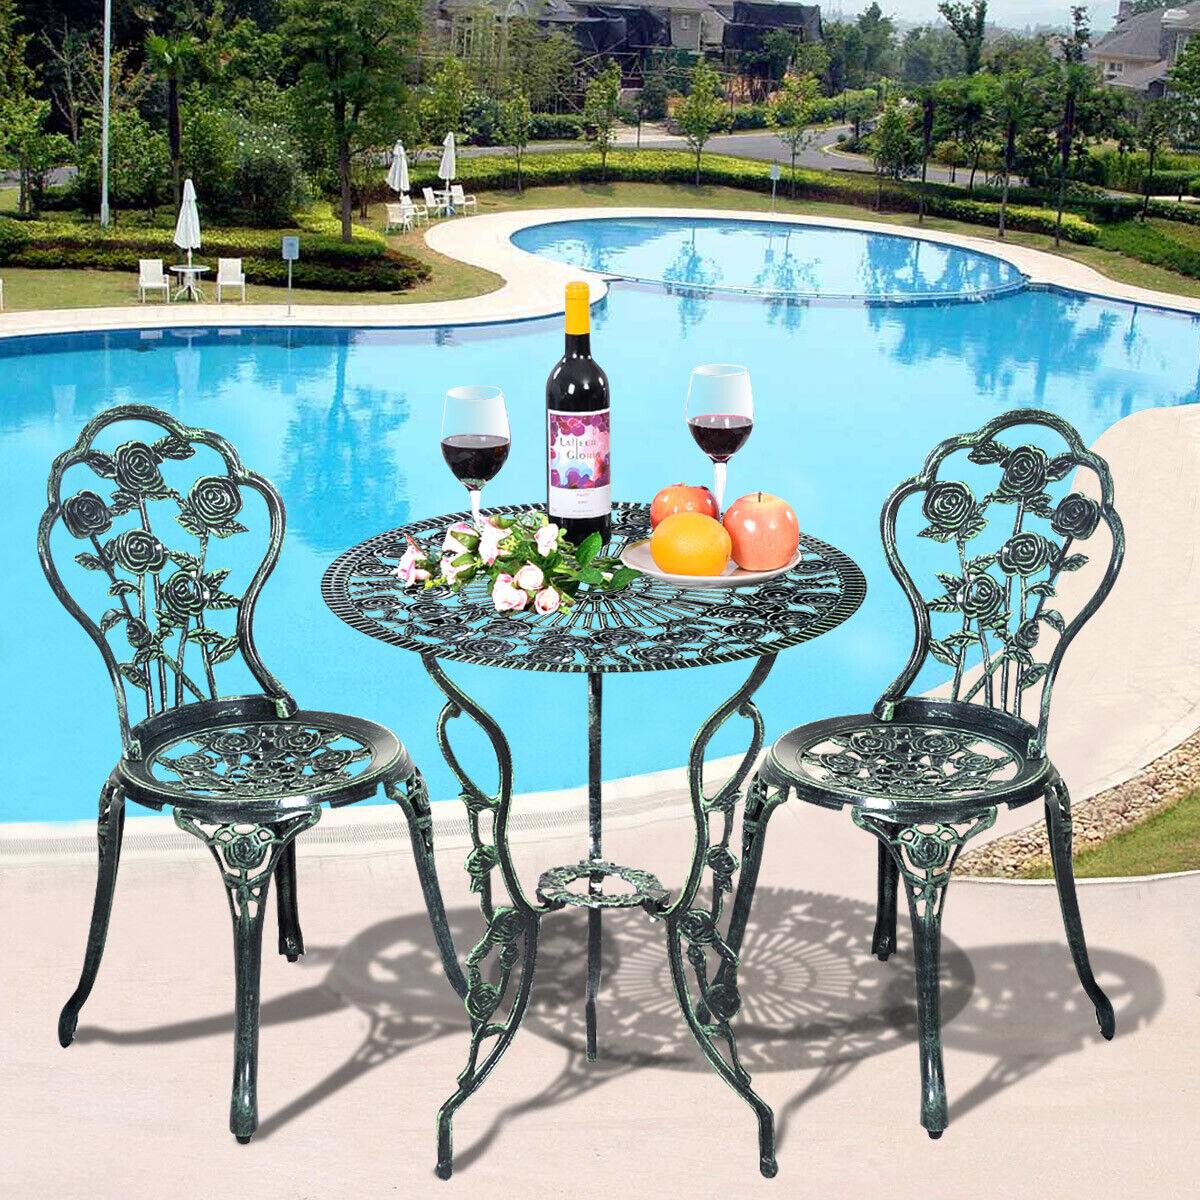 Garden Furniture - Aluminium Cafe Bistro Set Patio Cast Garden Outdoor Furniture Table and Chairs